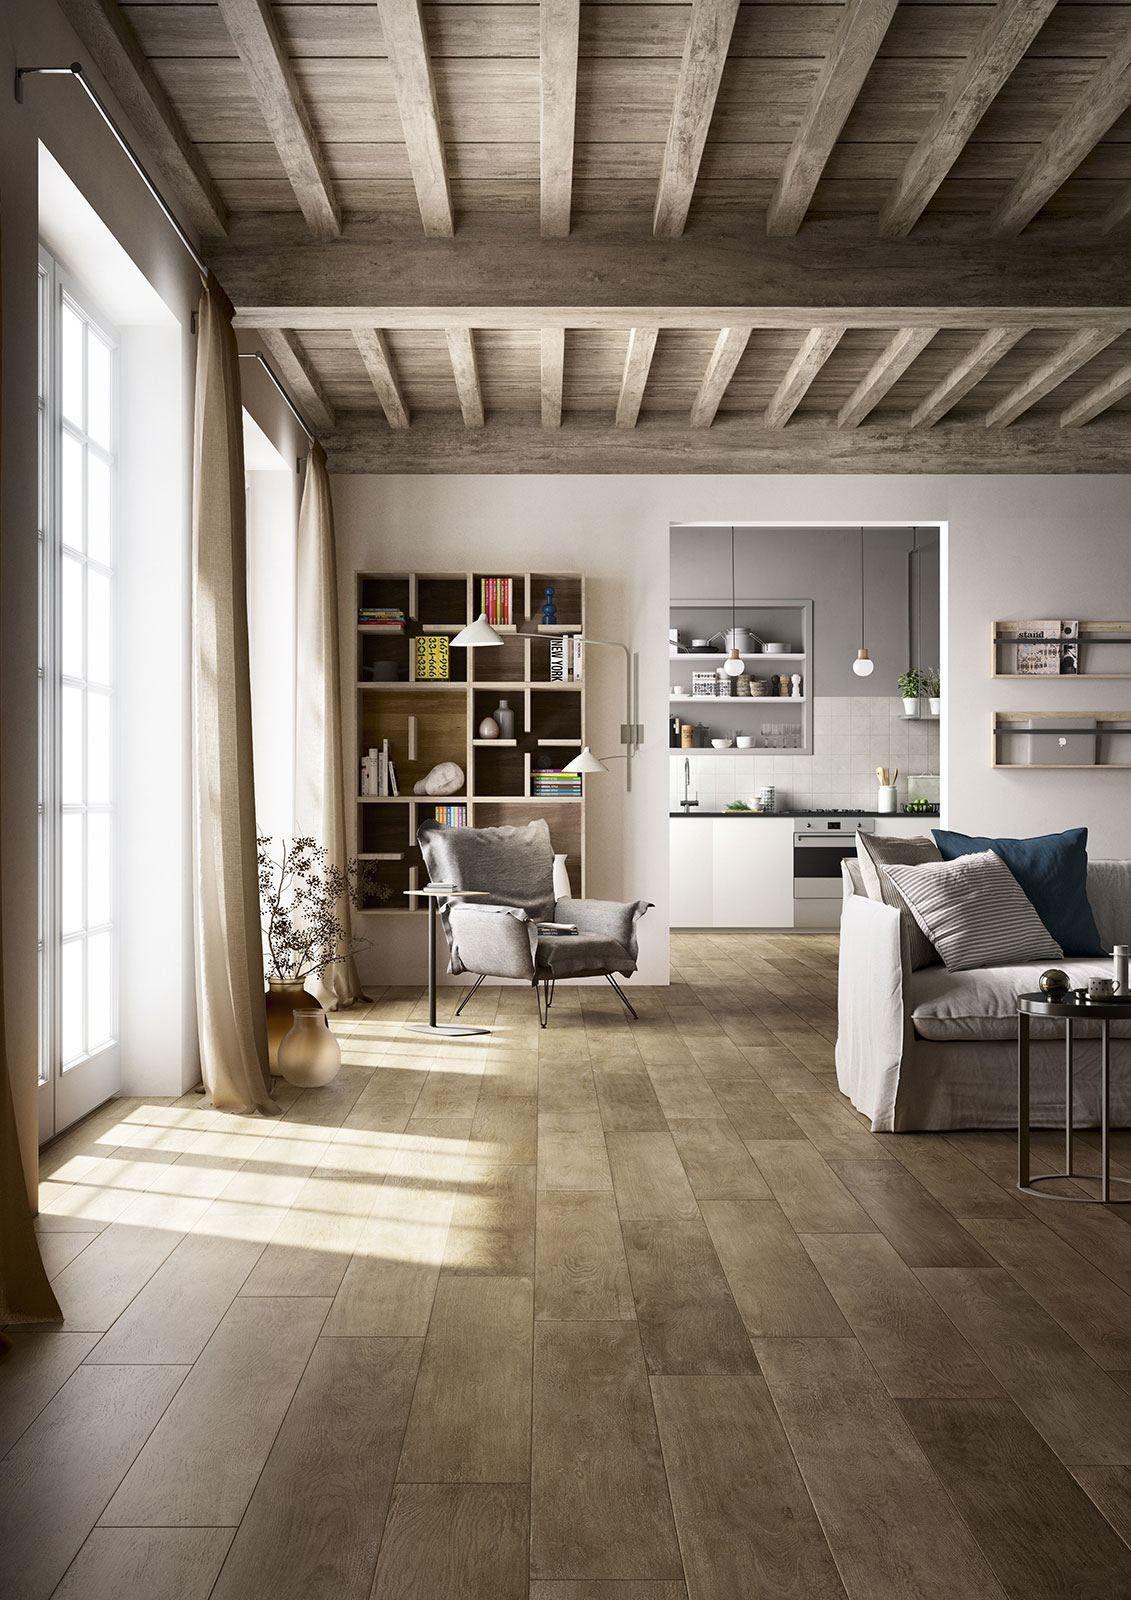 Hardwood Look Tile Floor Covering Assessments Absolute Best Brands Pros Vs Disadvantages Floor Design Farmhouse Flooring Home